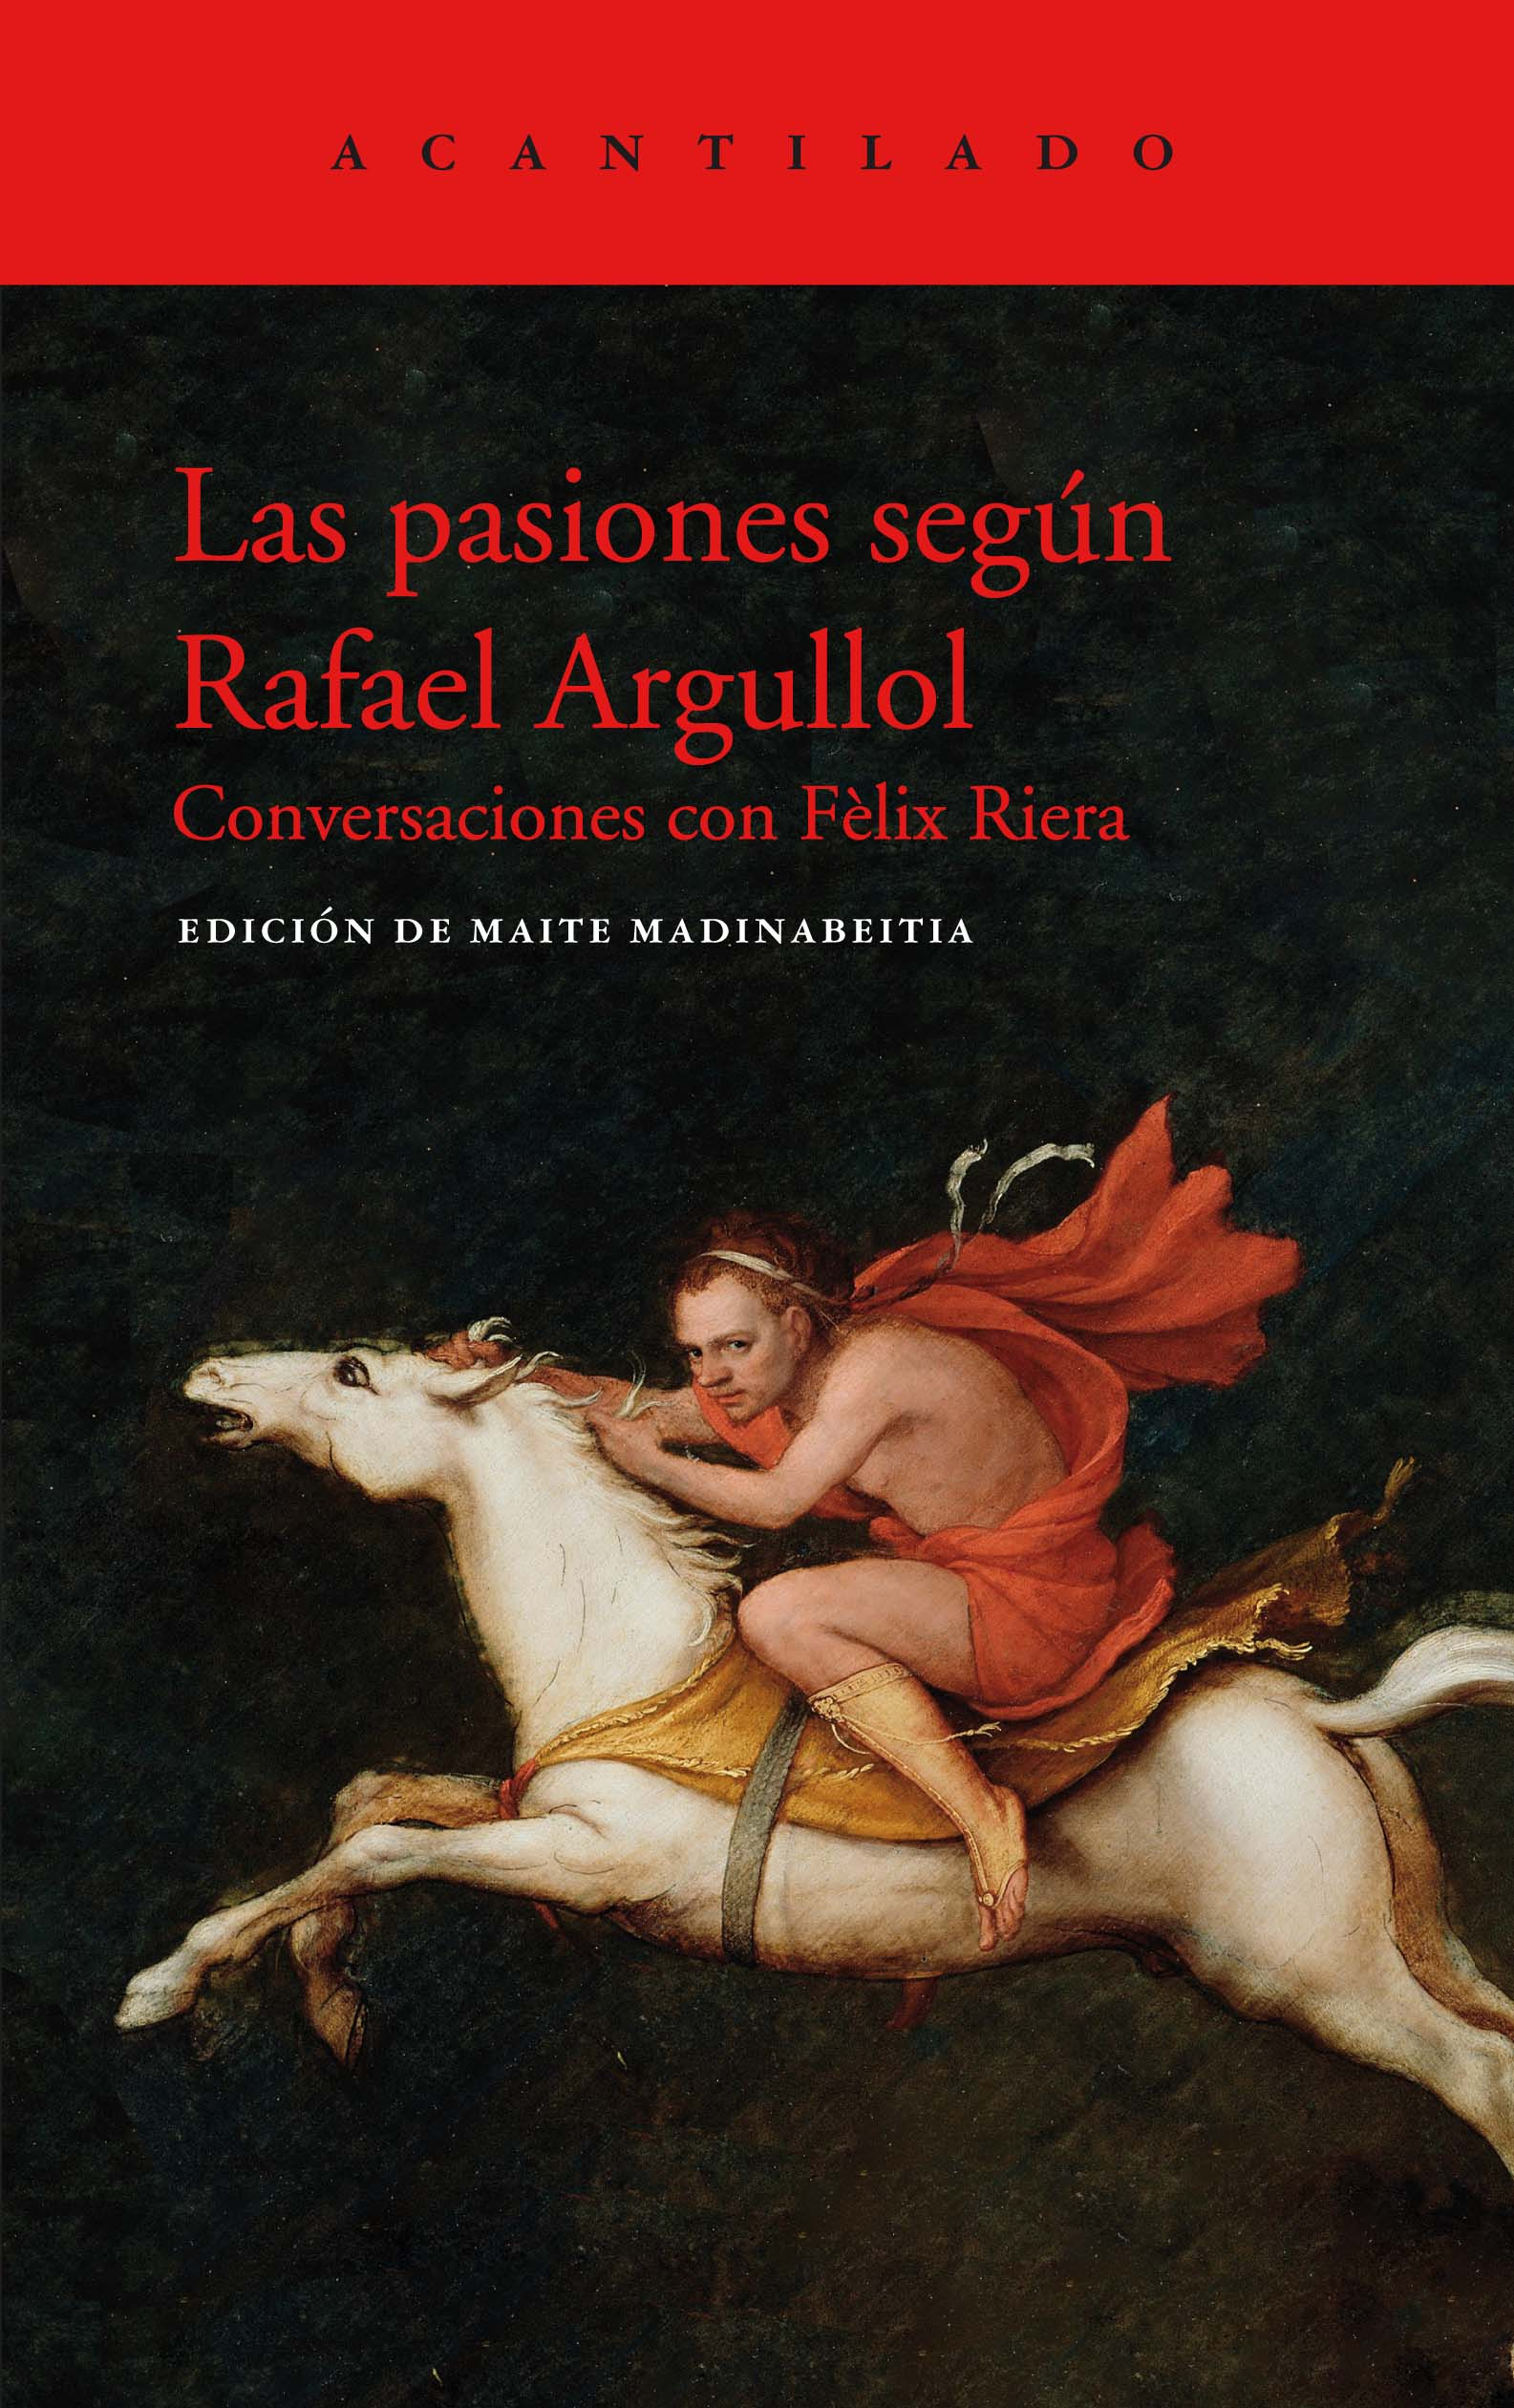 Las pasiones según Rafael Argullol   «Conversaciones con Fèlix Riera»